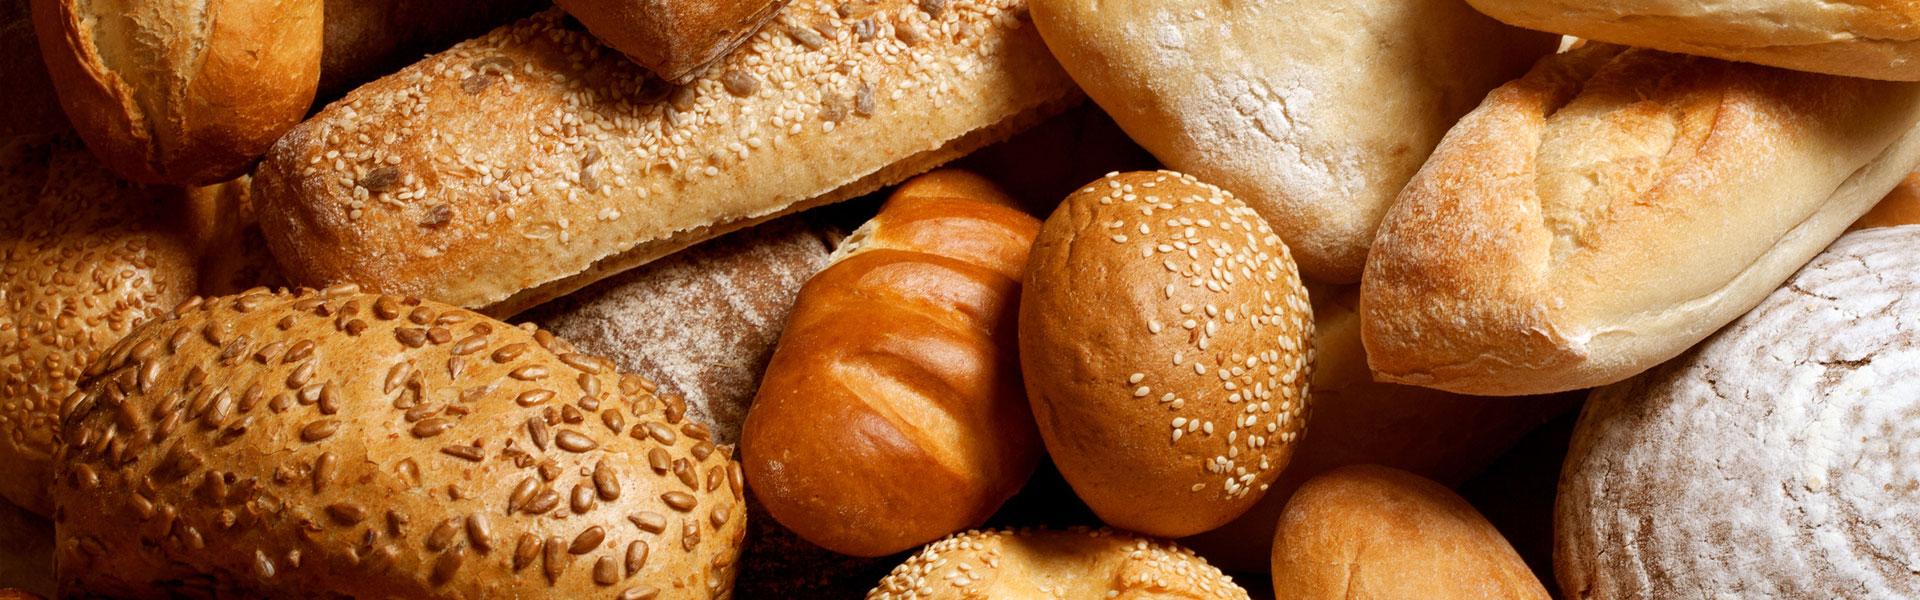 Bäckerei Riedle Produkte